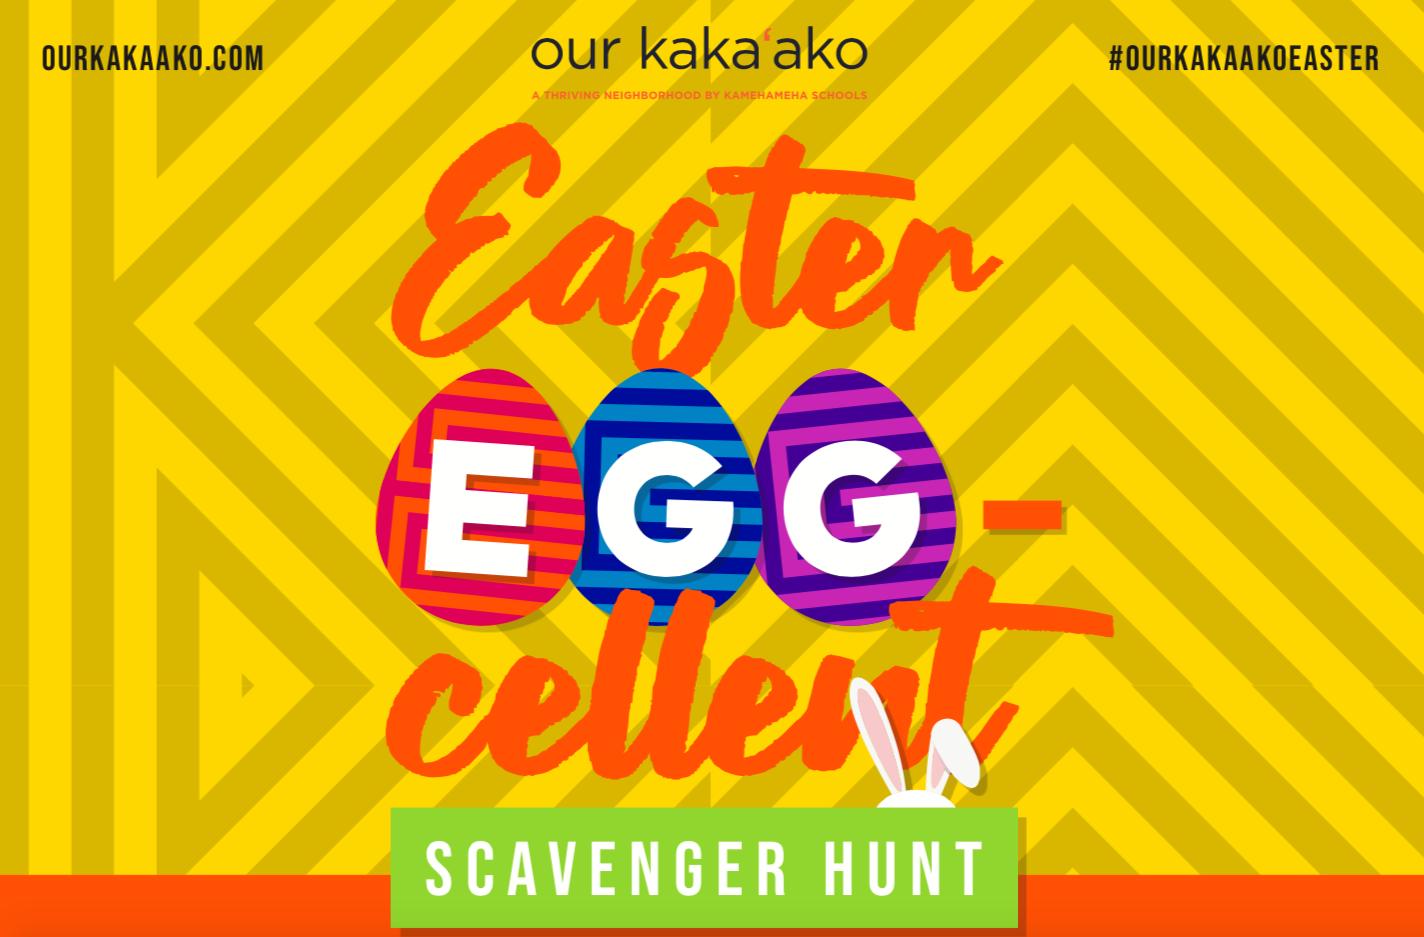 Easter Eggcellent Our Kaka'ako